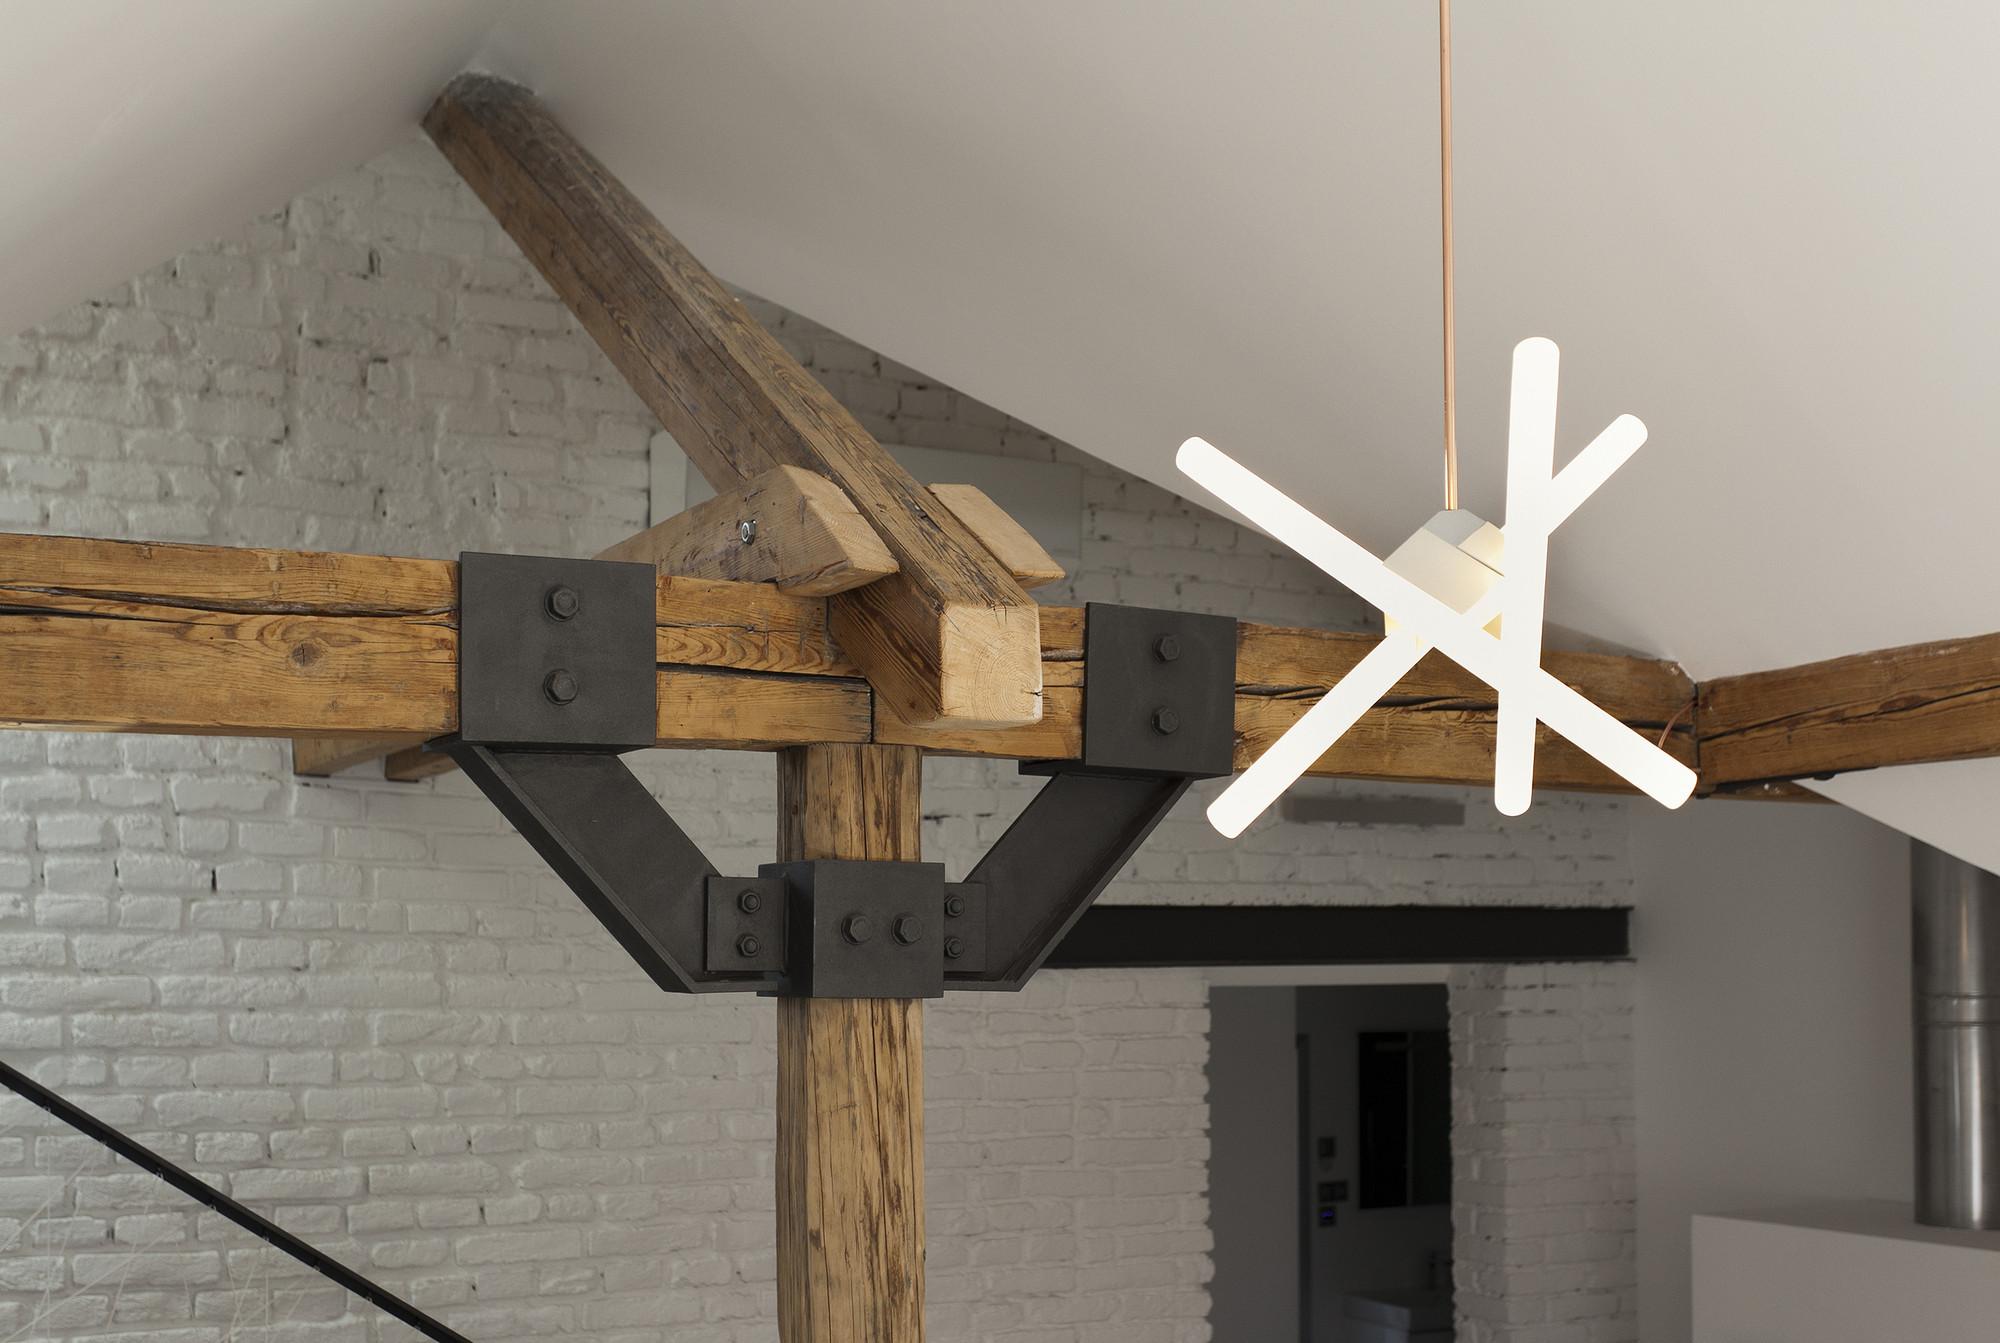 Attic_Loft_Reconstruction_-_11_-_detail_beams